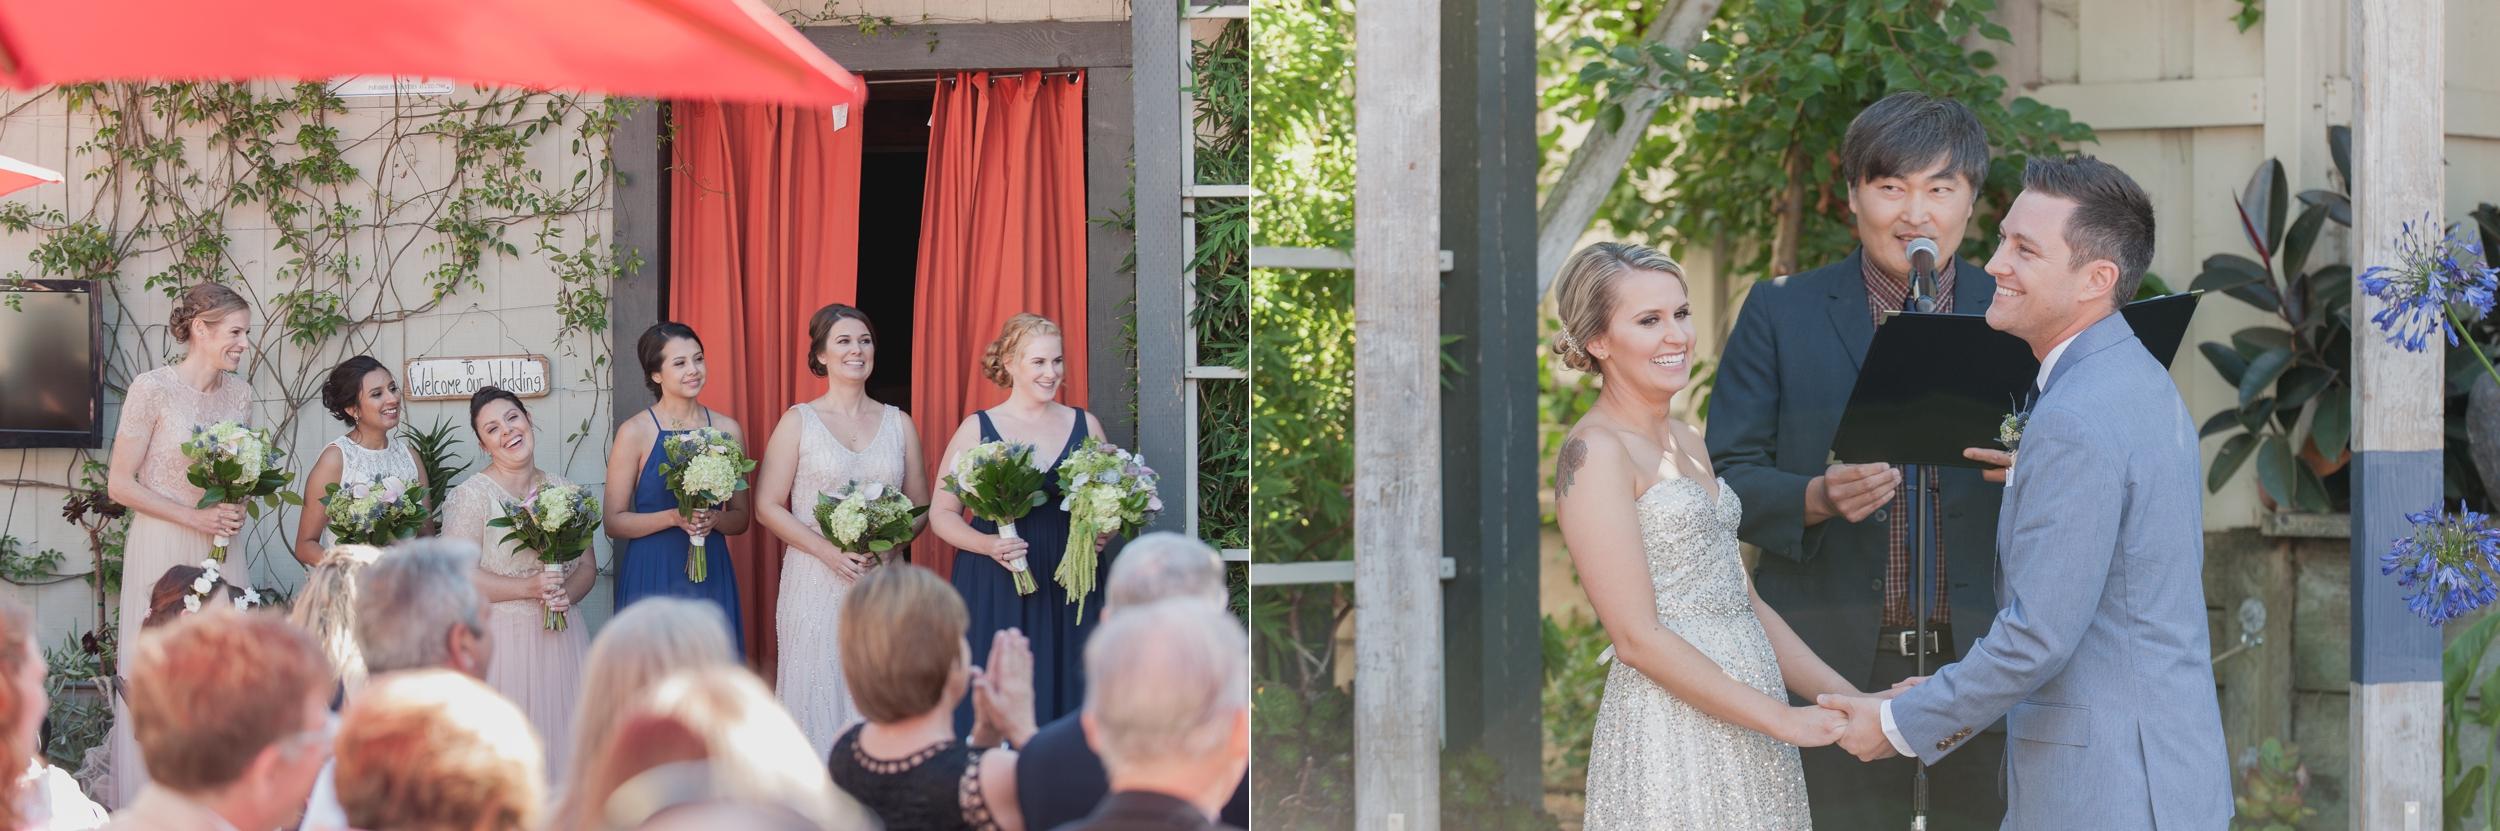 studio-333-sausalito-wedding-photographer-vc18.jpg